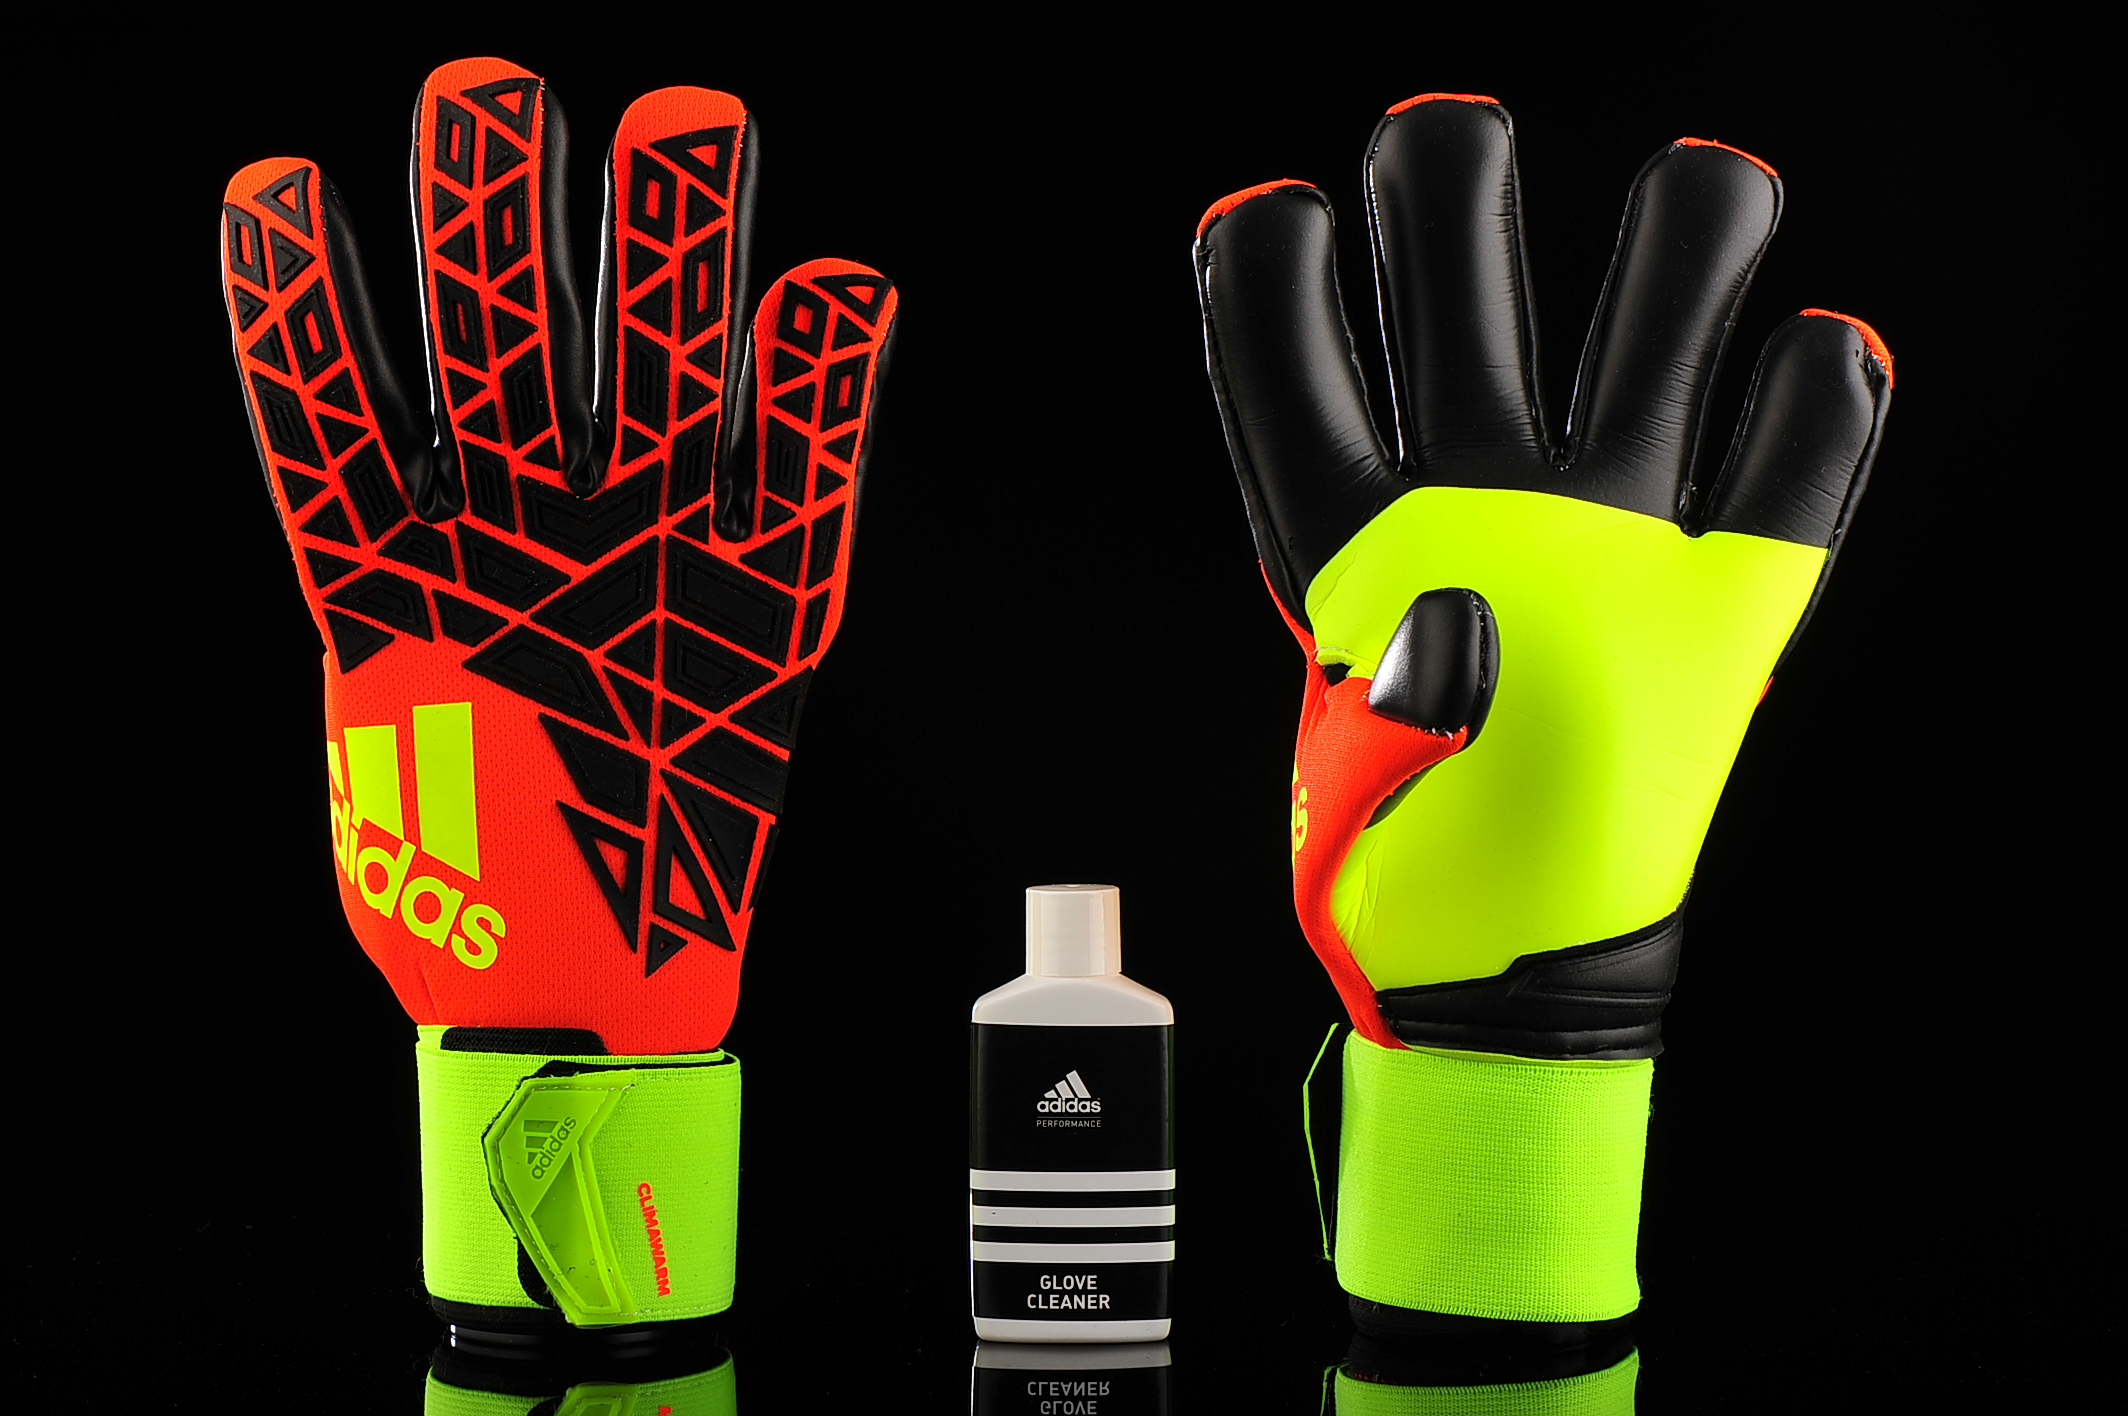 Petición Marco Polo Premisa  Goalkeeper Gloves adidas Ace Climawarm AP6993 | R-GOL.com - Football boots  & equipment